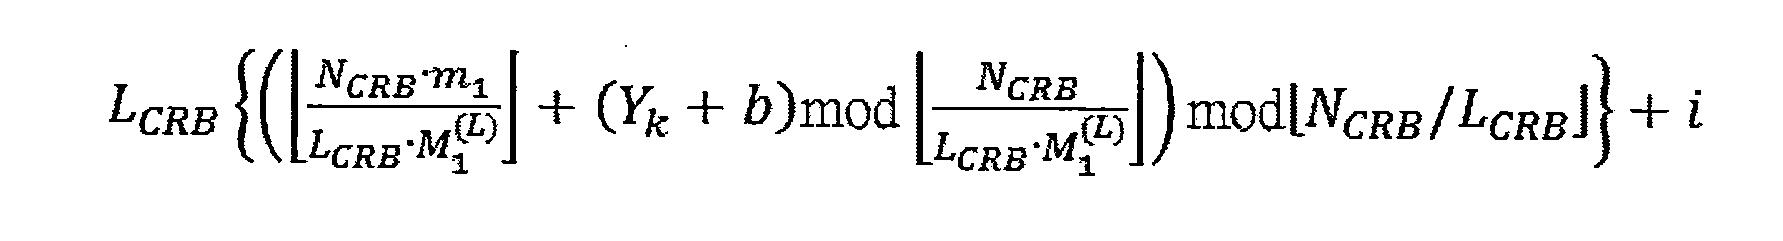 Figure 105123758-A0202-12-0014-1